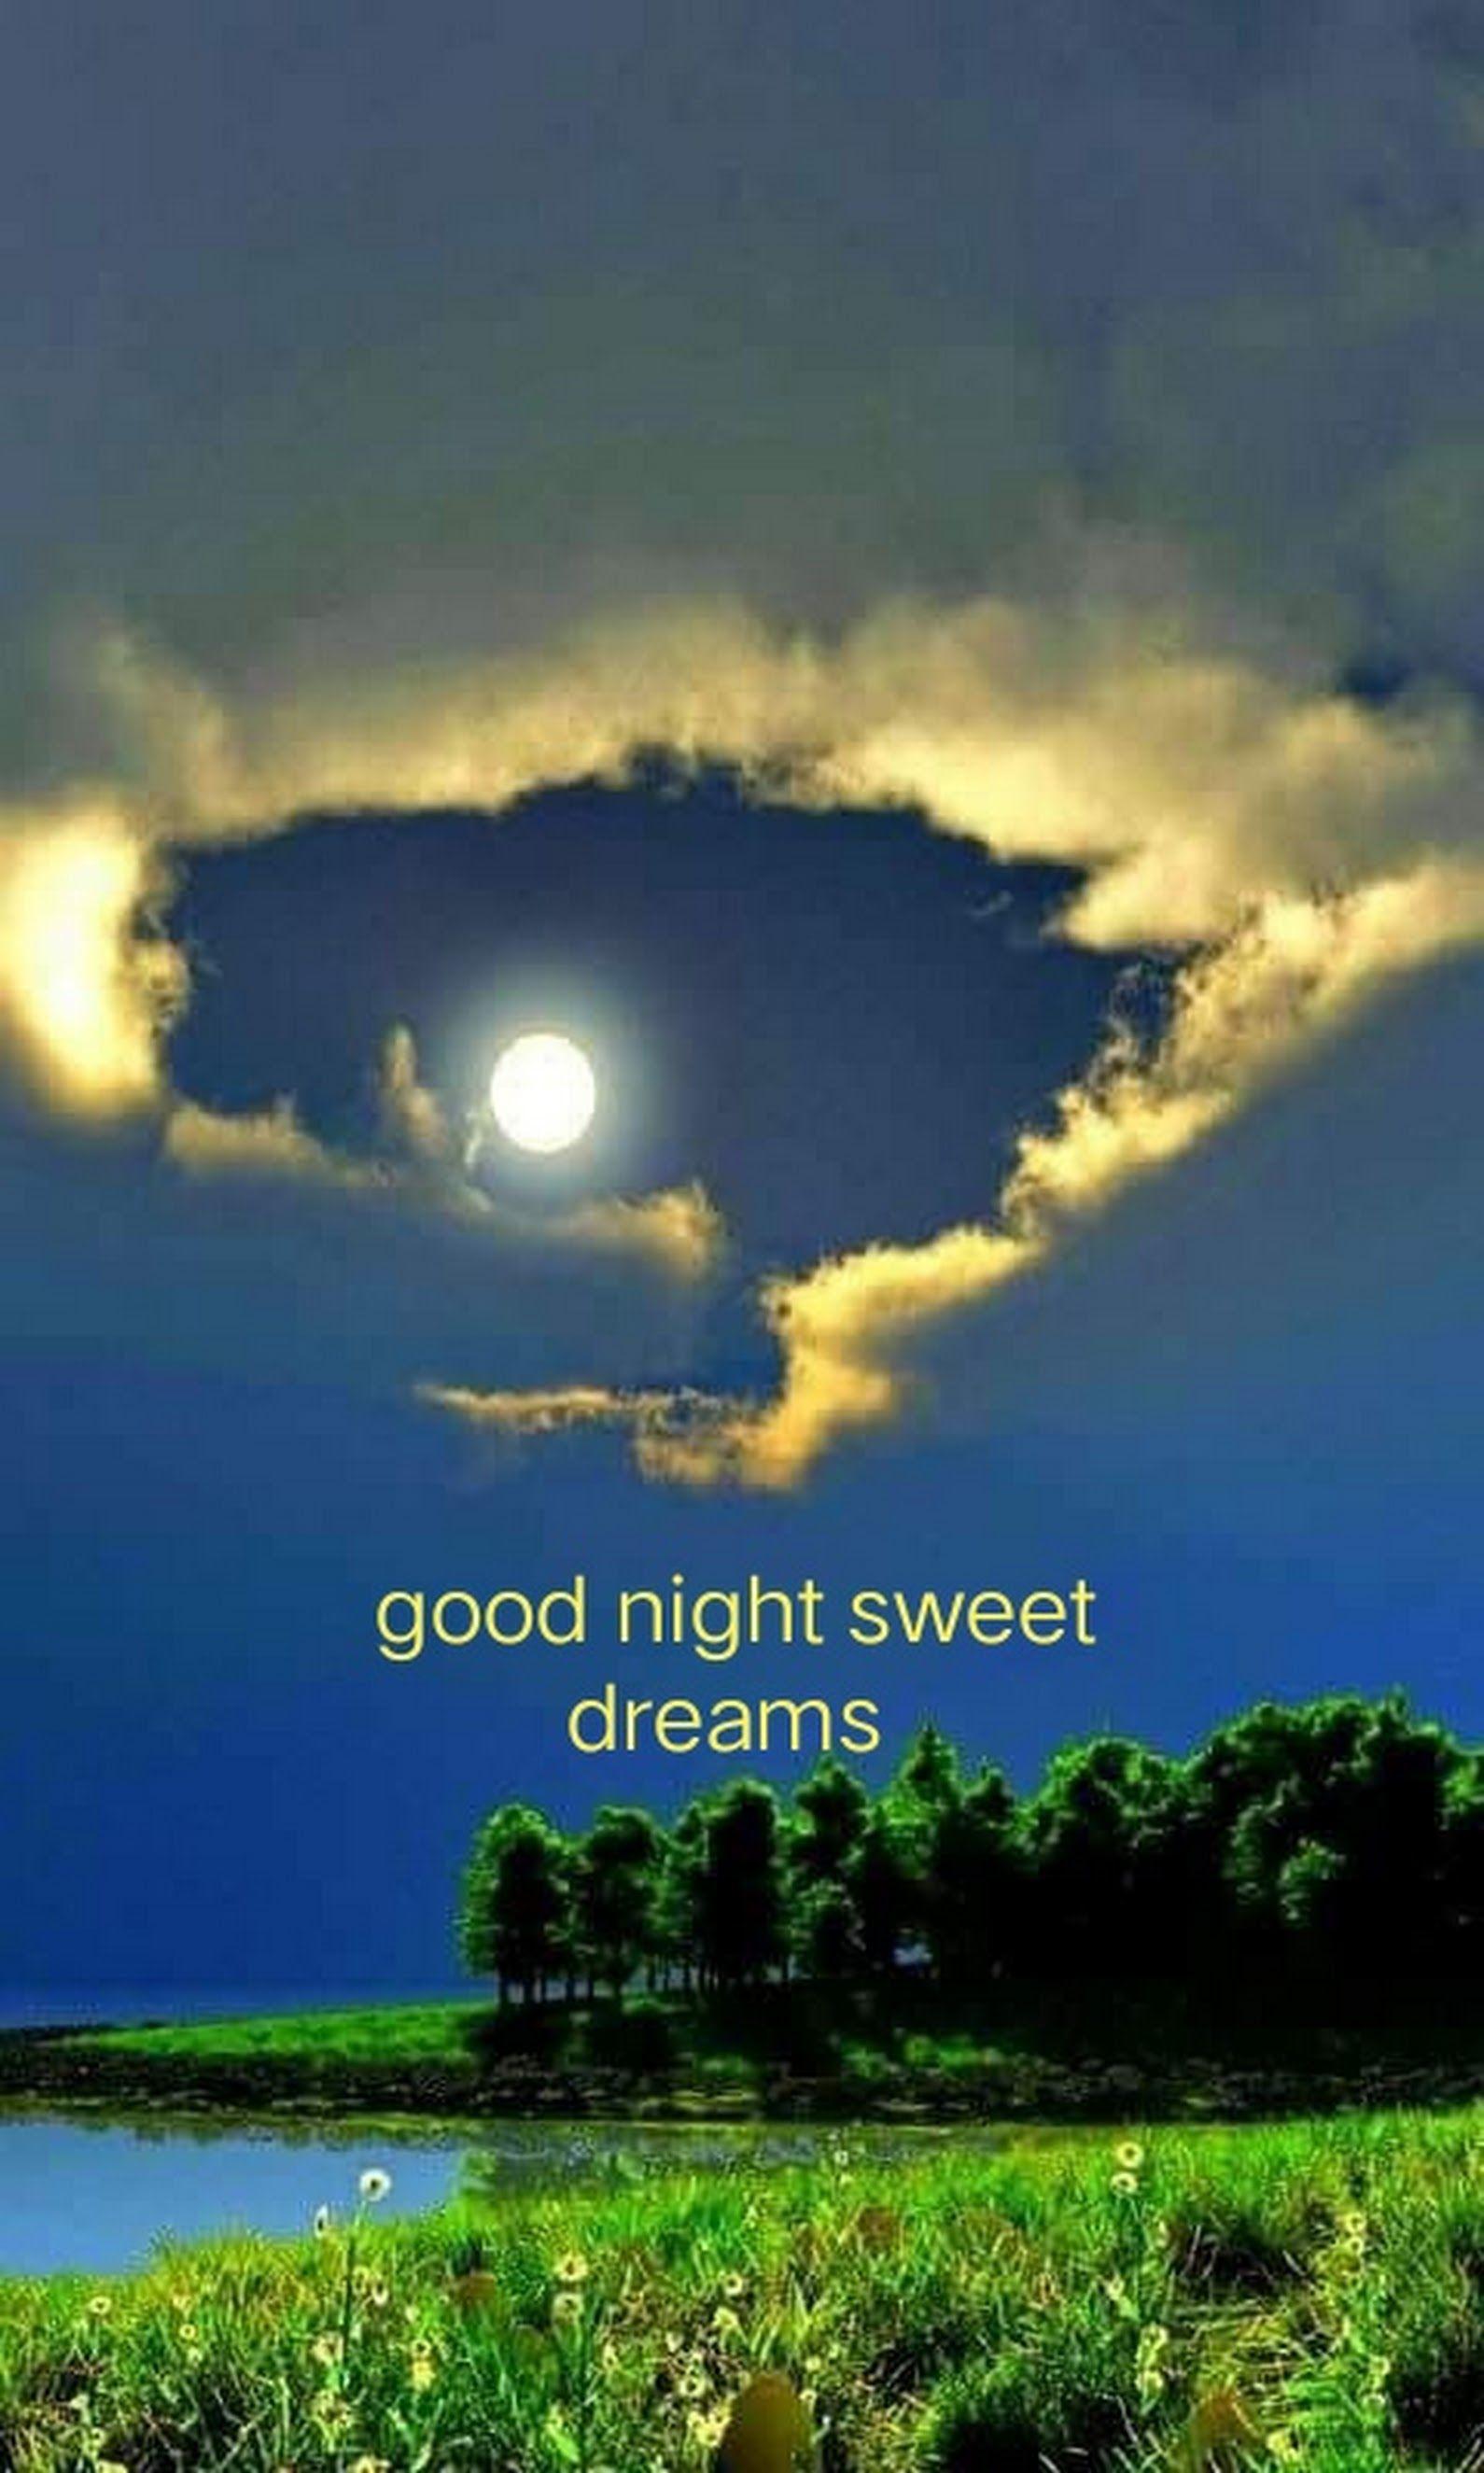 Sign in | Good night sweet dreams, Good night image, Good night massage